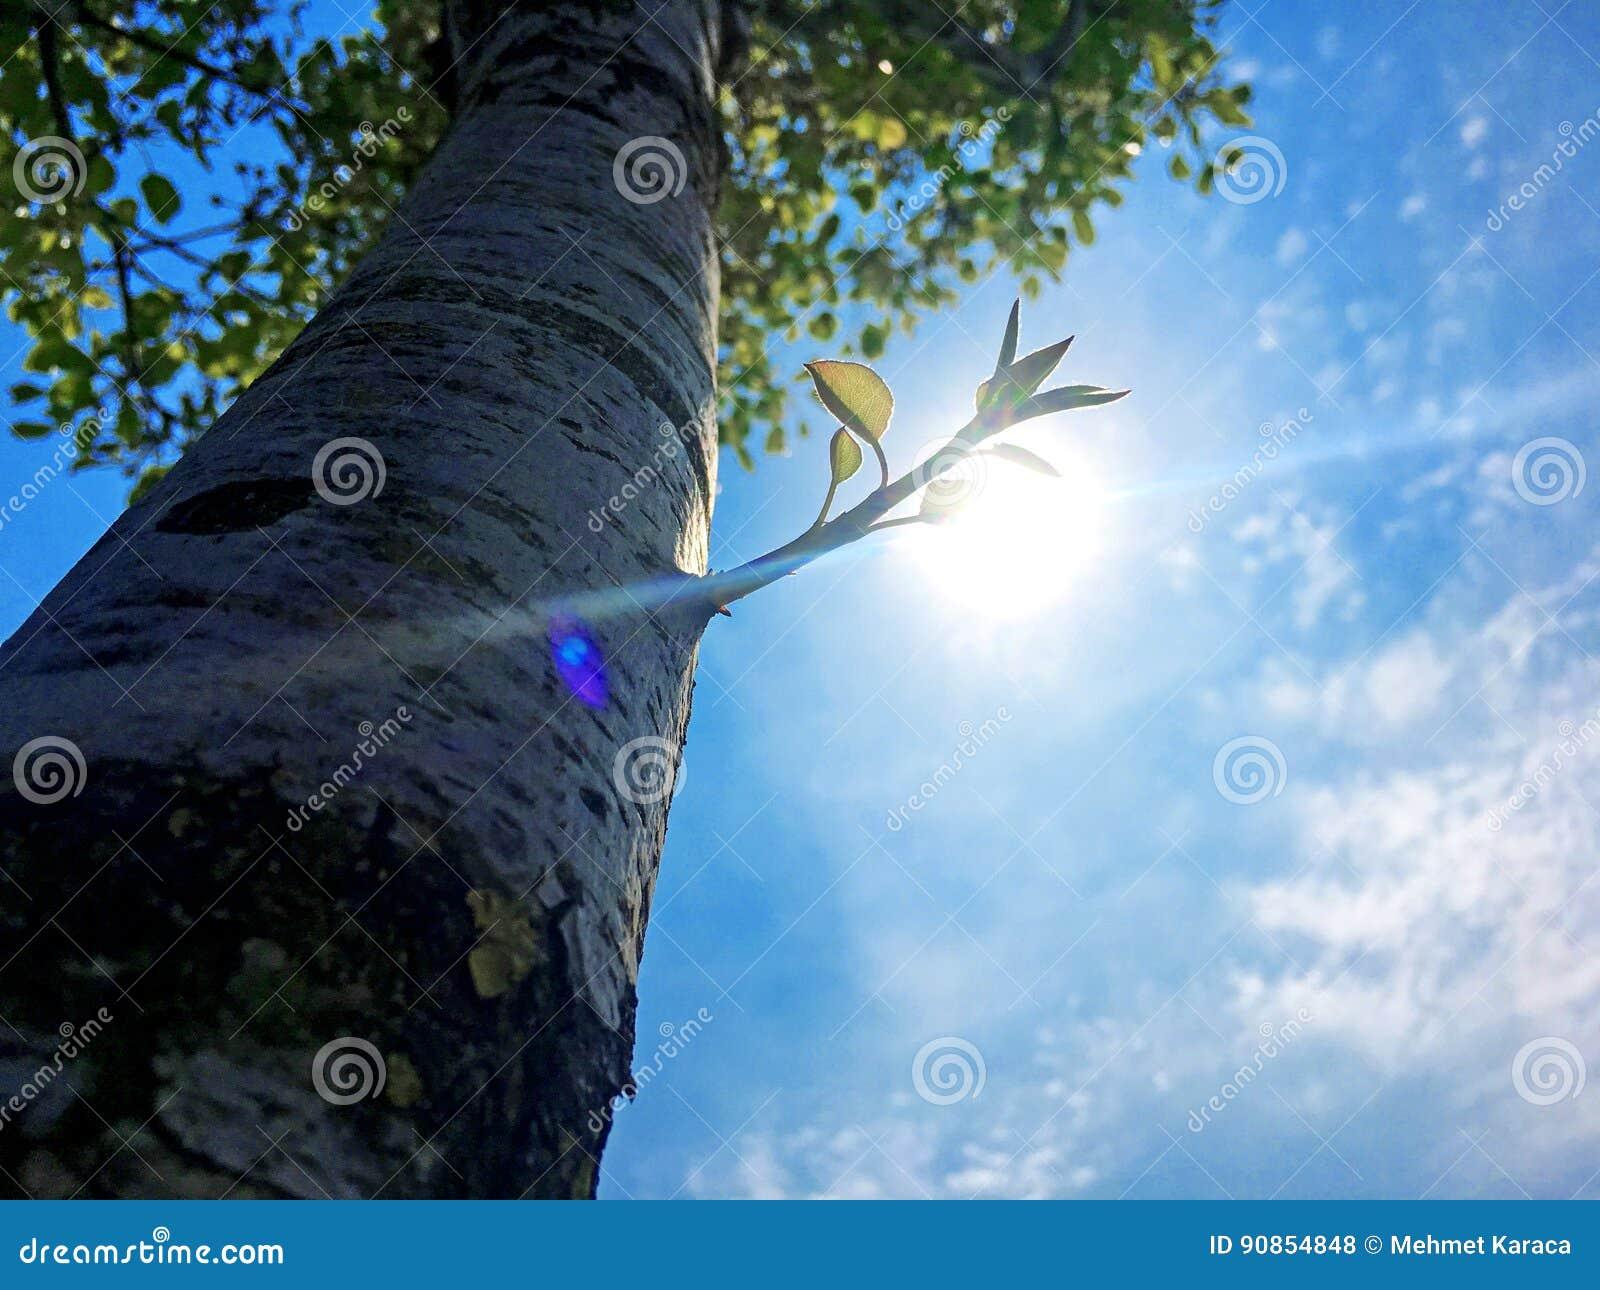 Tree and Bud